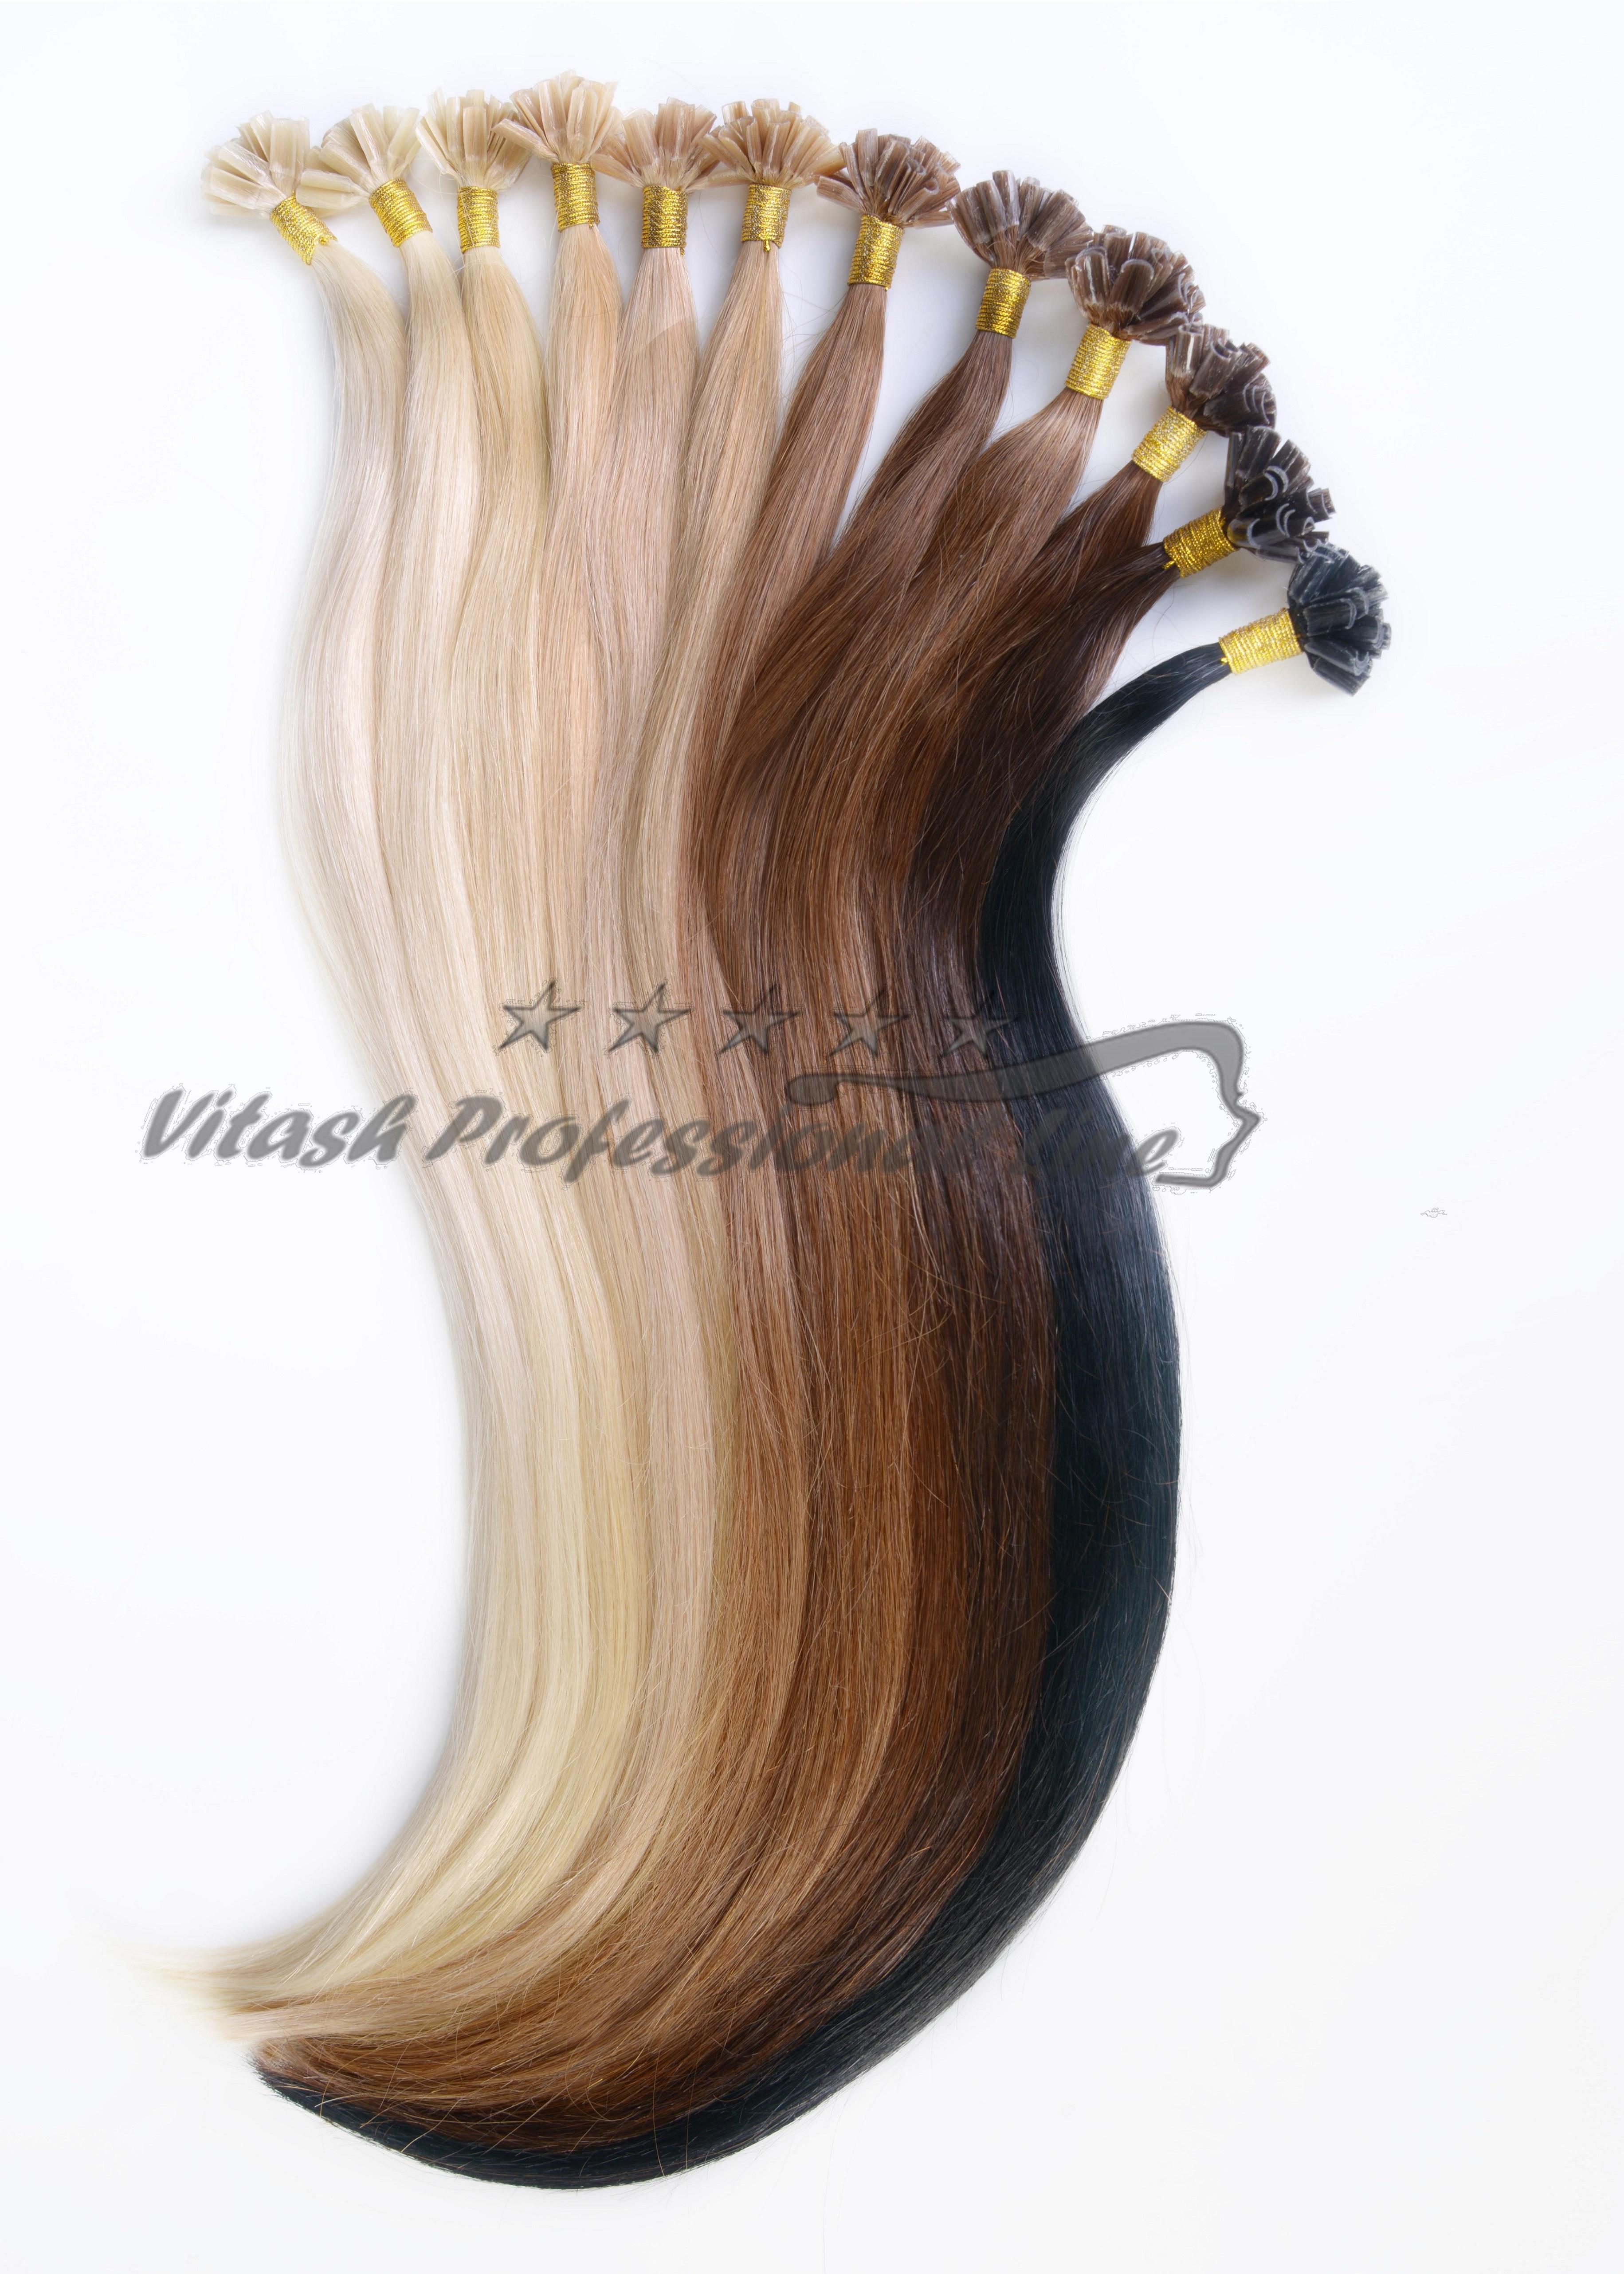 100 remy human hair echthaar extensions haarverl ngerung keratin bonding 1g ebay. Black Bedroom Furniture Sets. Home Design Ideas